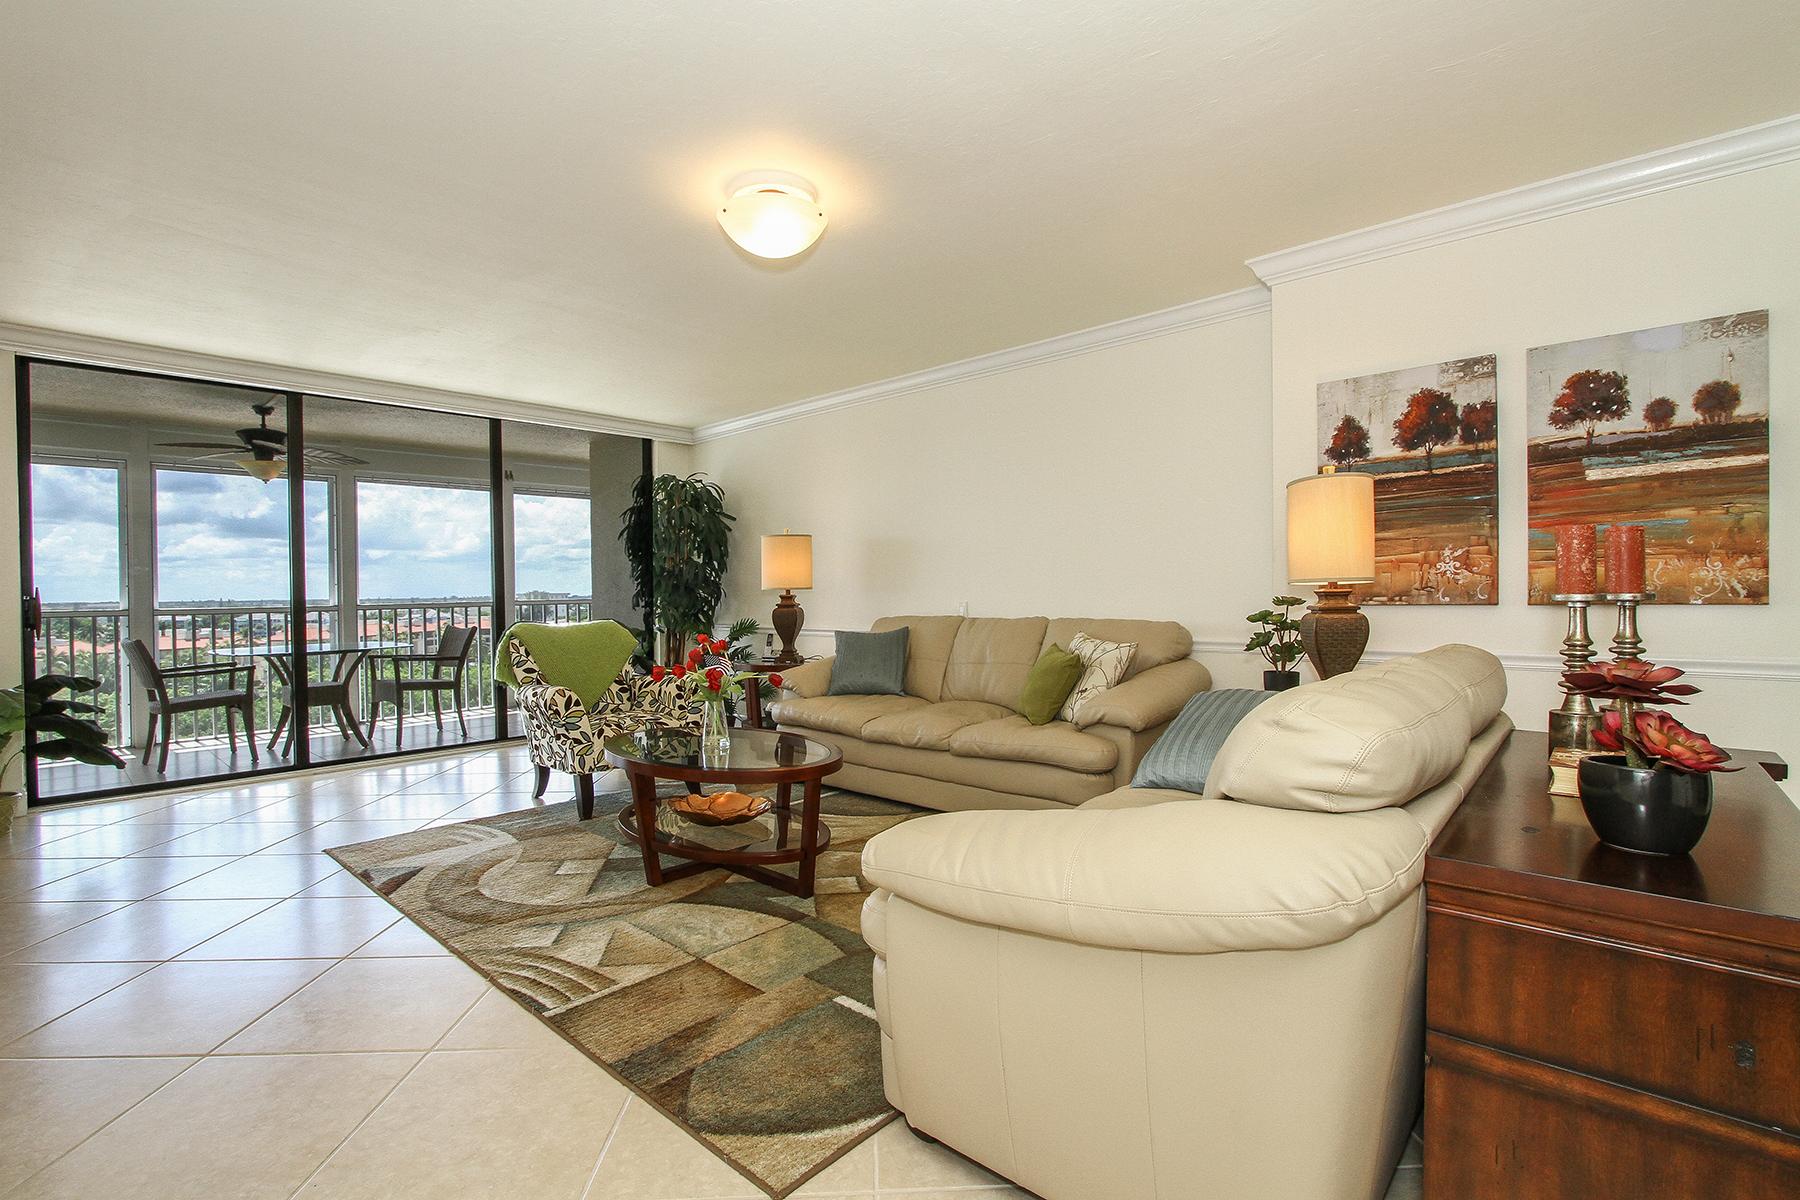 Condominium for Rent at PARK SHORE - MONACO BEACH CLUB 4401 Gulf Shore Blvd N E-908, Naples, Florida 34103 United States